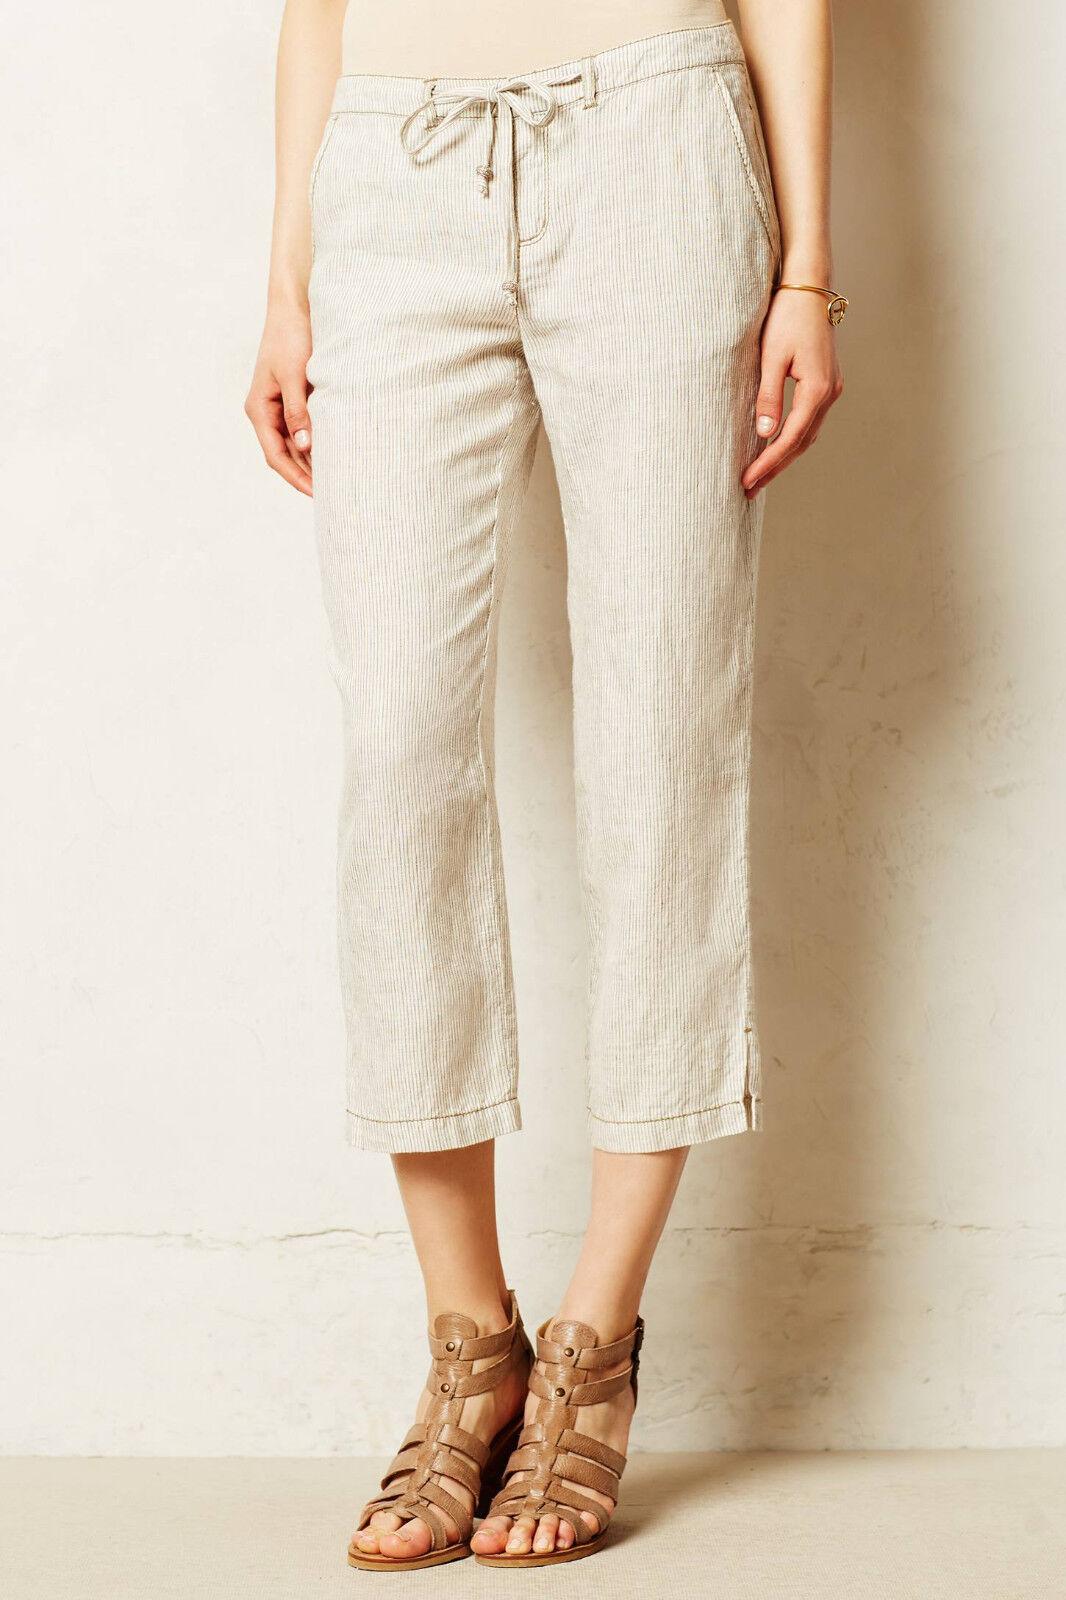 Marrakech Paden Linen Pants Size 27 Neutral Motif NW ANTHROPOLOGIE Tag